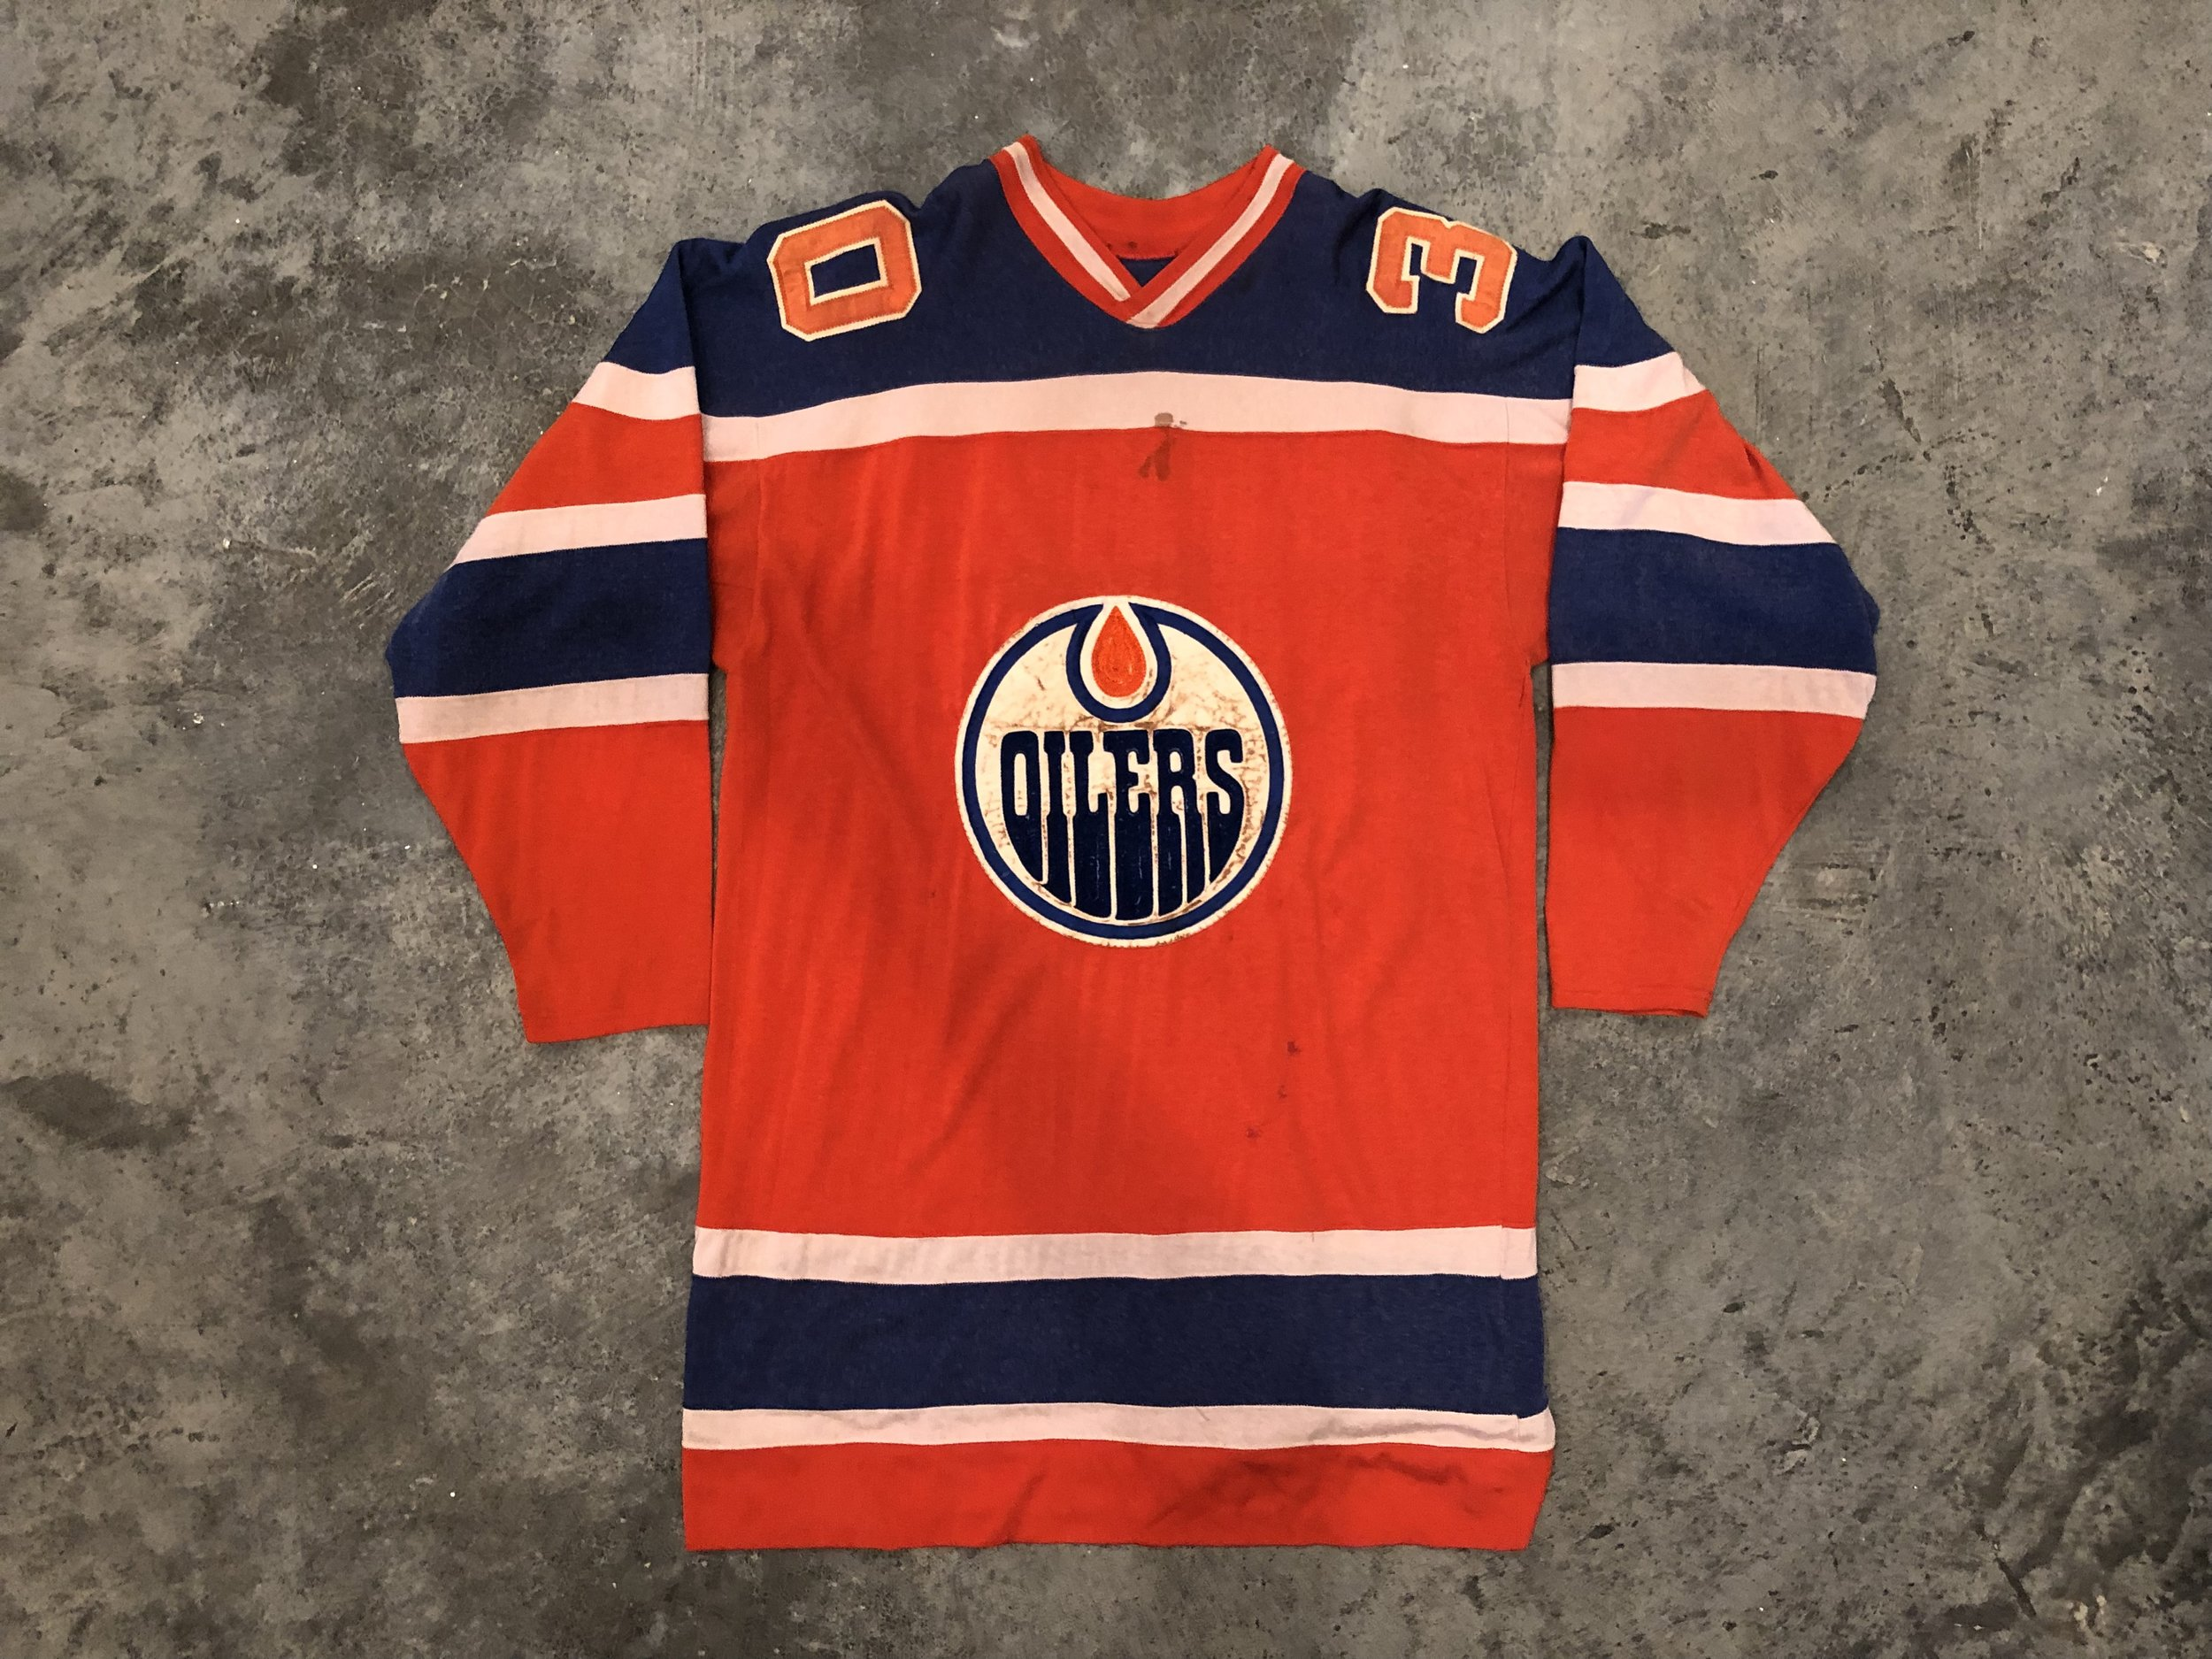 1972-73 Jack Norris & 1974-75 Jacques Plante Edmonton Oilers game worn road jersey